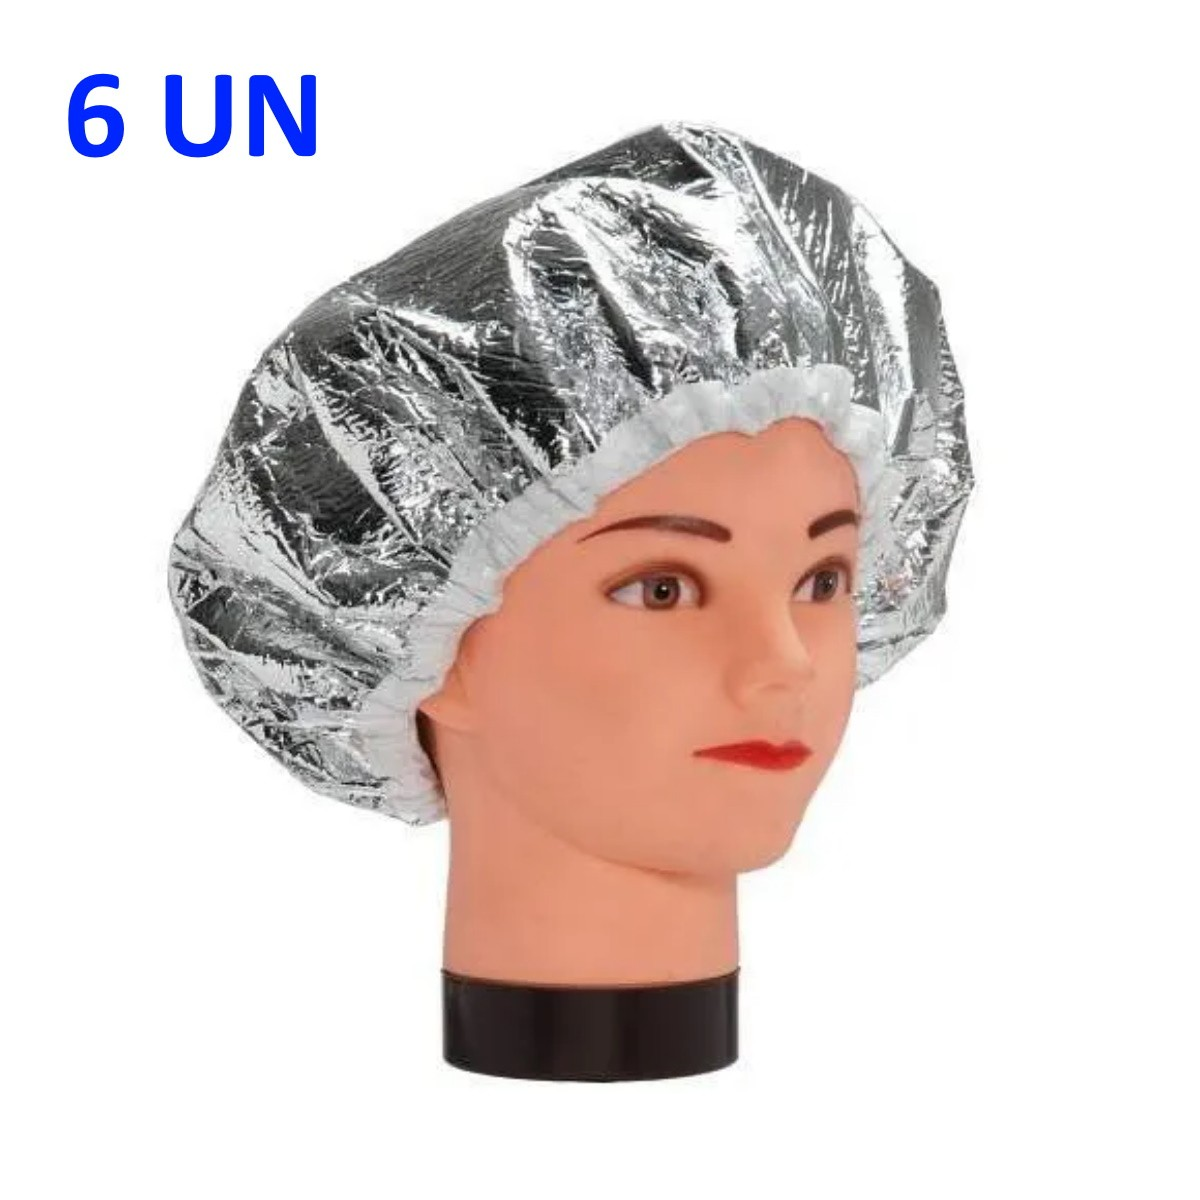 Touca Metalizada com Isolmanta 6 UN Prata - Santa Clara